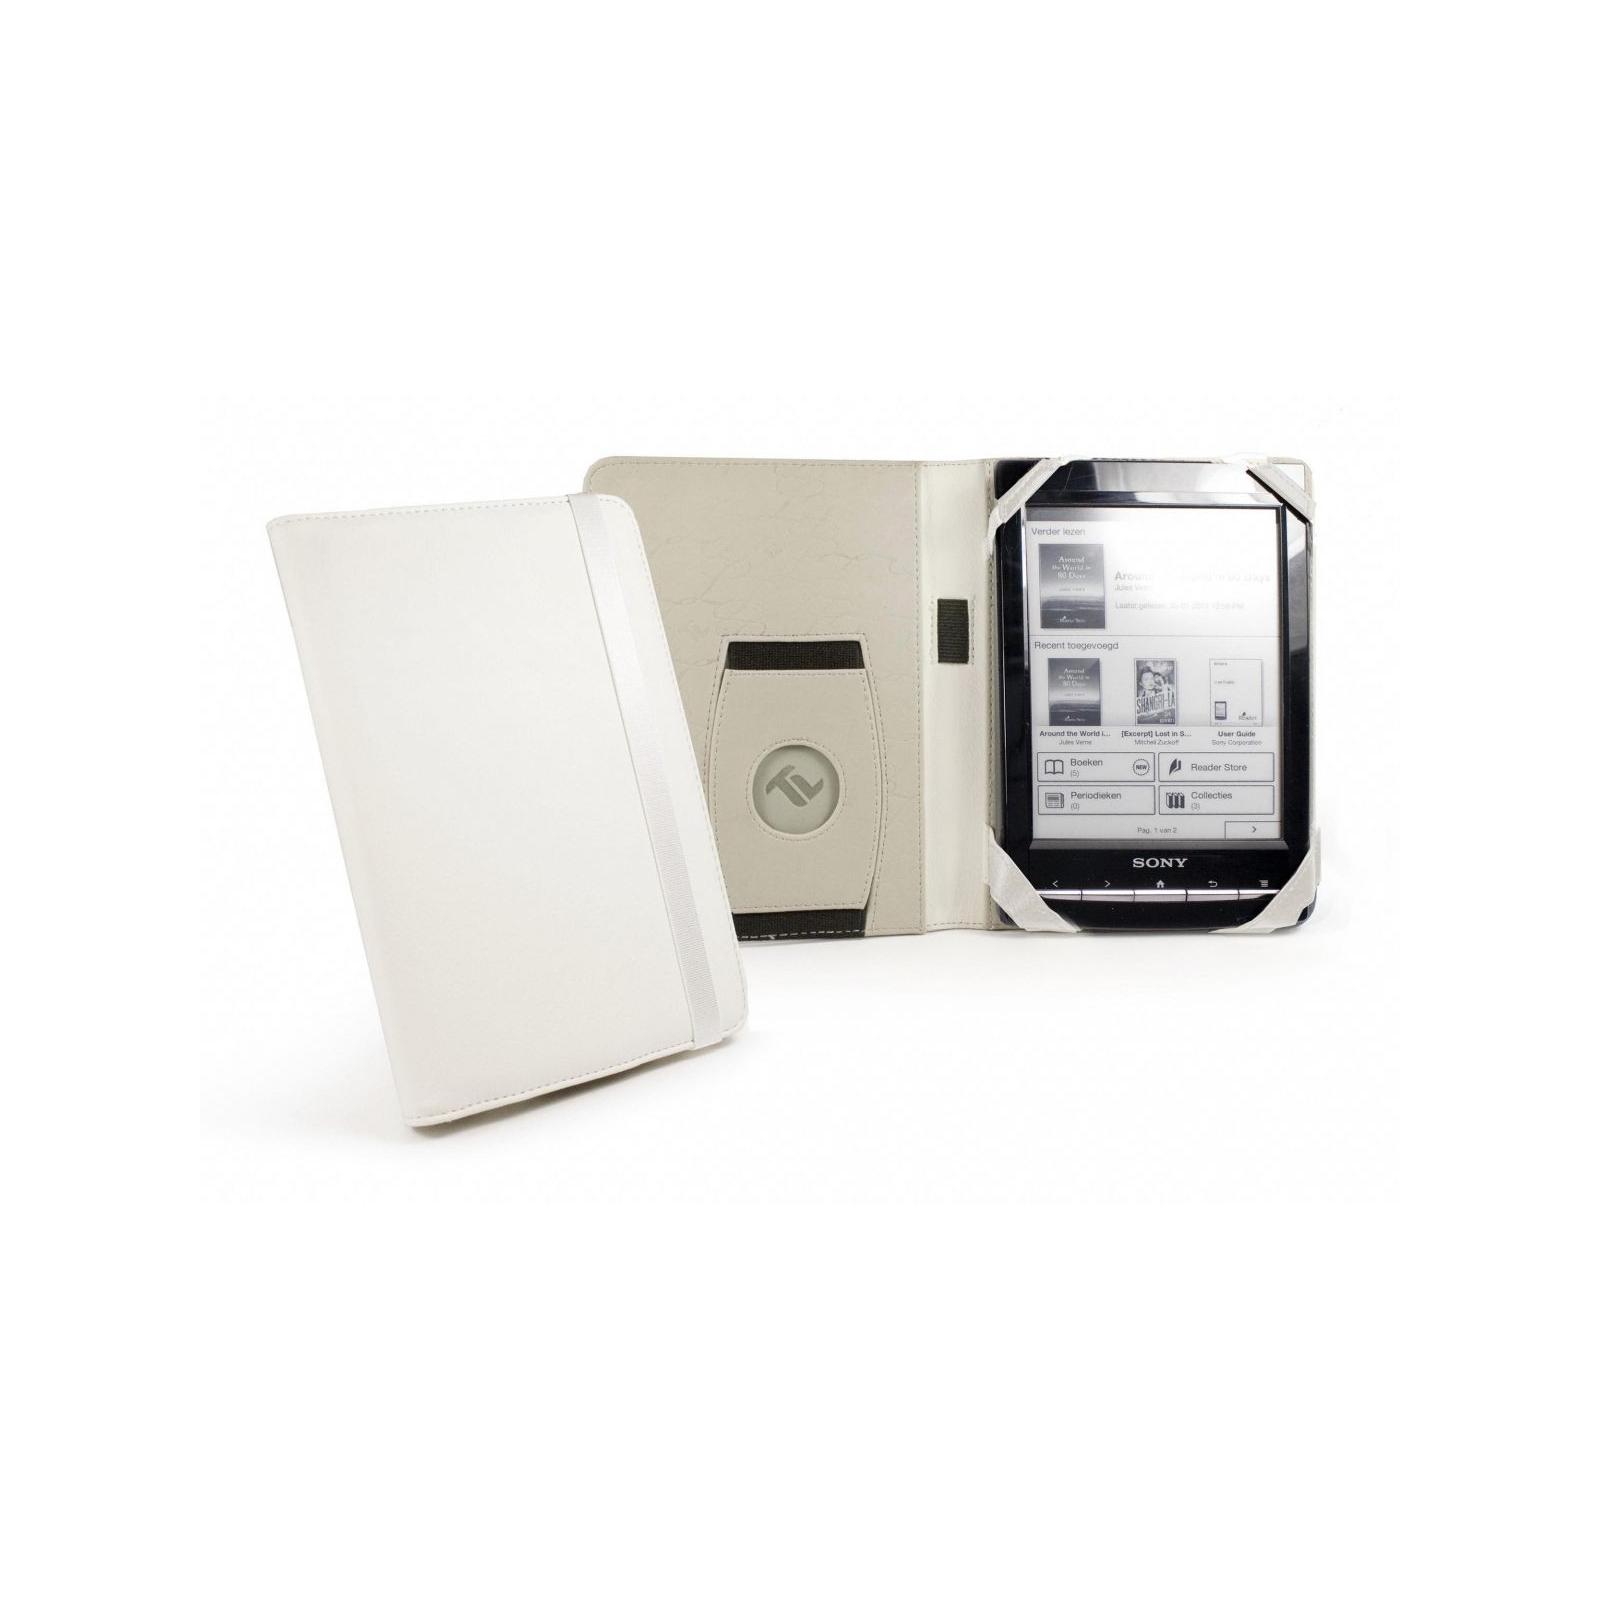 Чехол для электронной книги Tuff-Luv 6 Embrace faux leather/Arctic White (C4_56) изображение 3